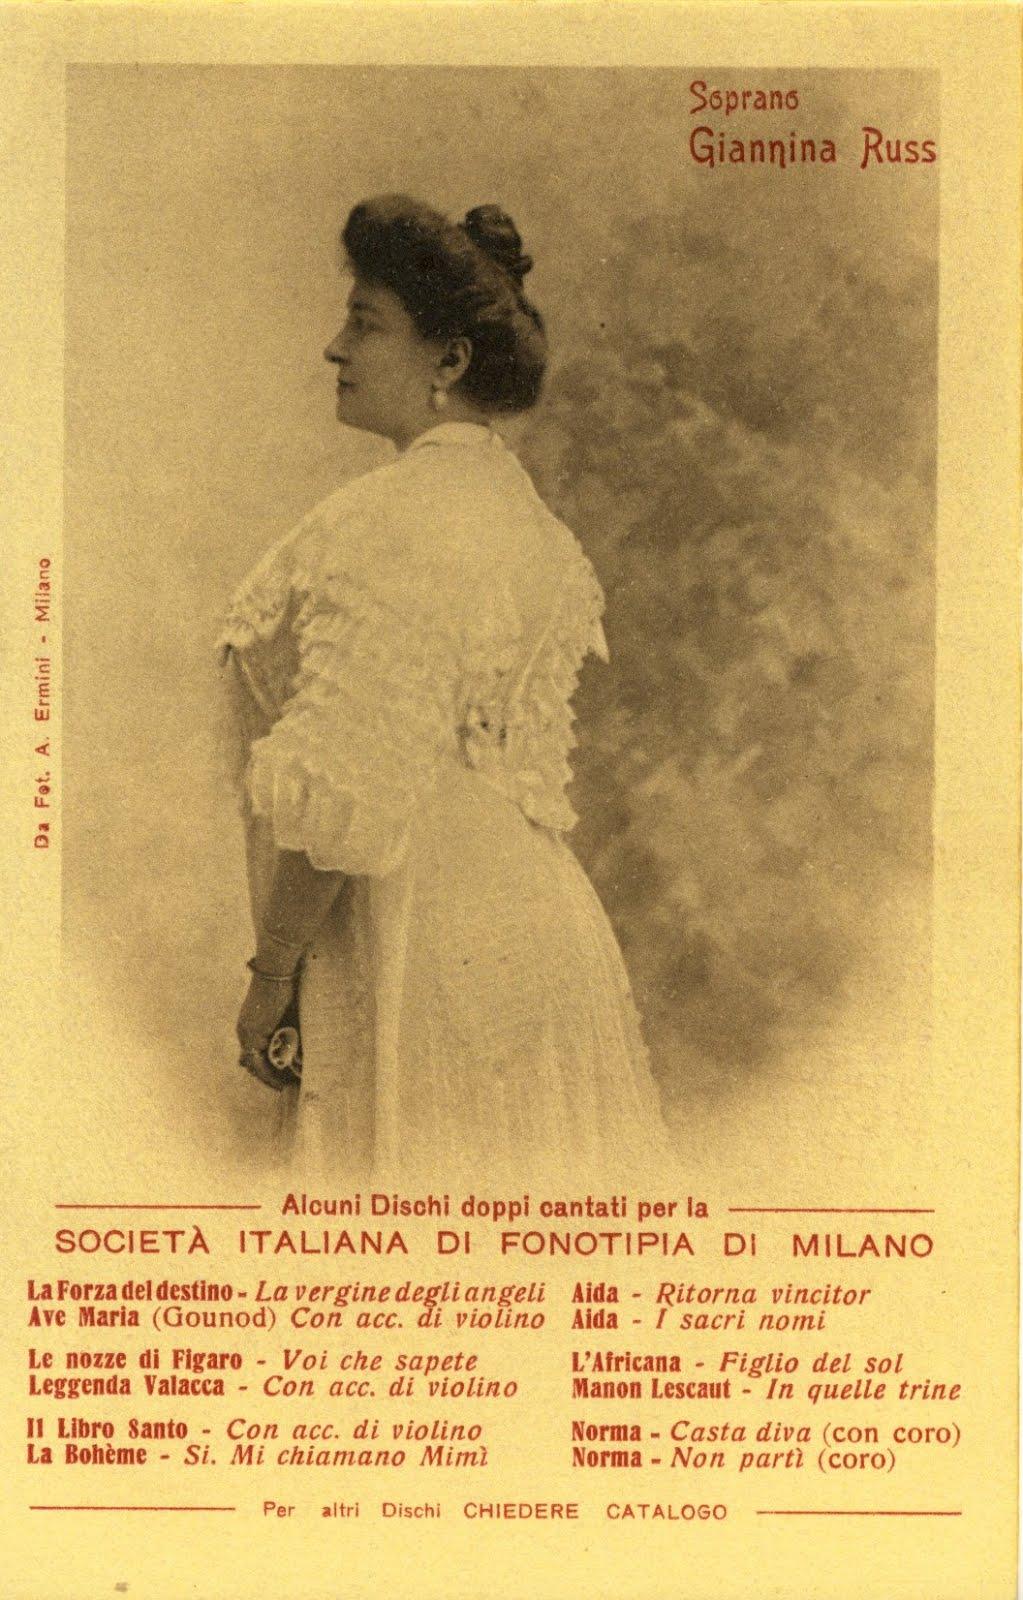 GREAT ITALIAN SOPRANO GIANNINA RUSS (1873 1951) CD SOLD